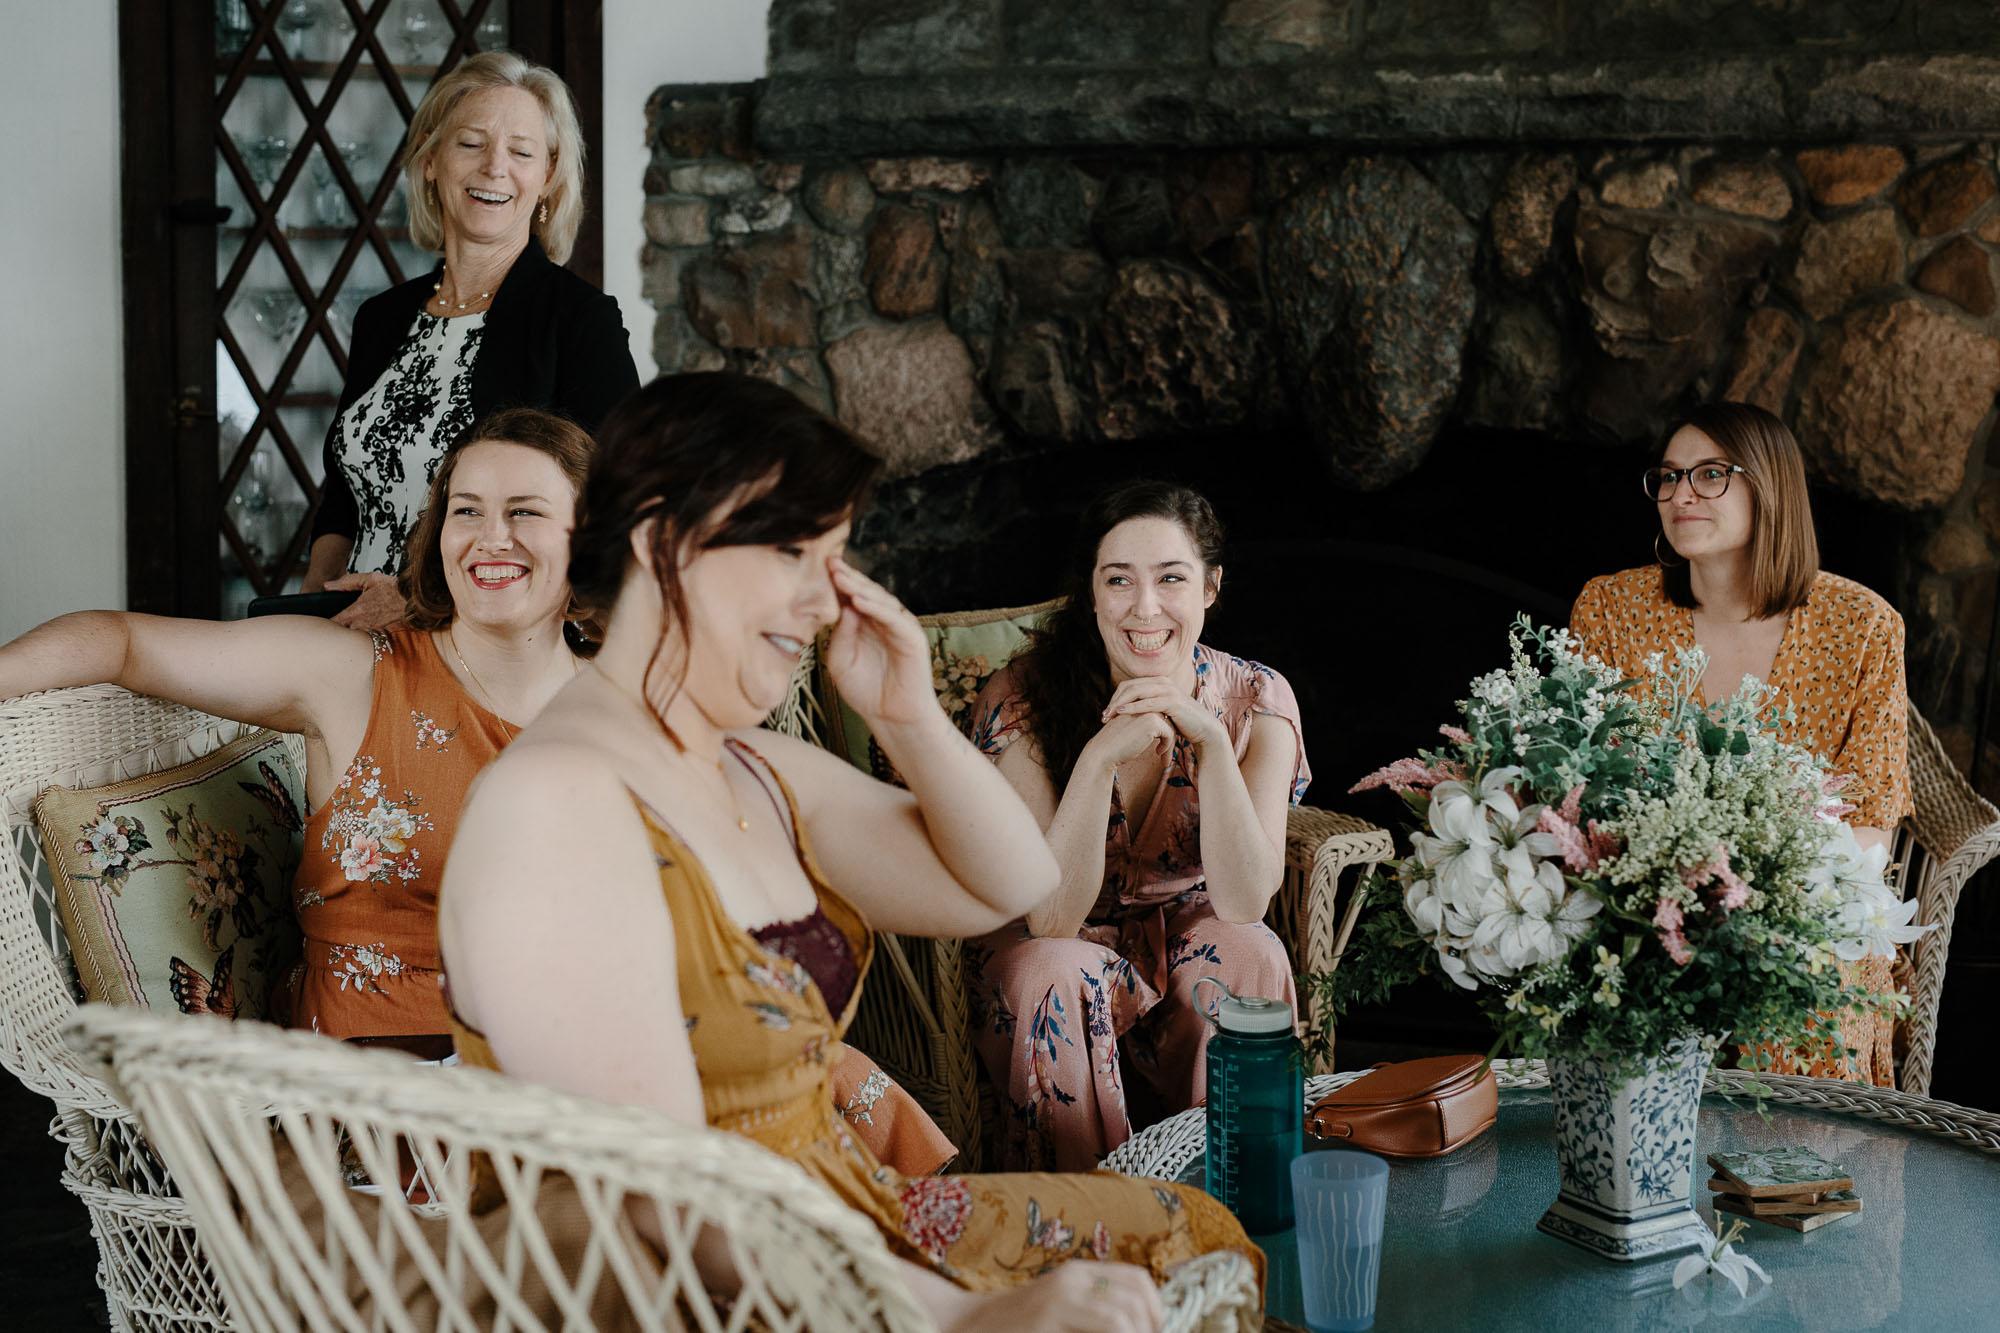 julia-nick-wedding-44.jpg